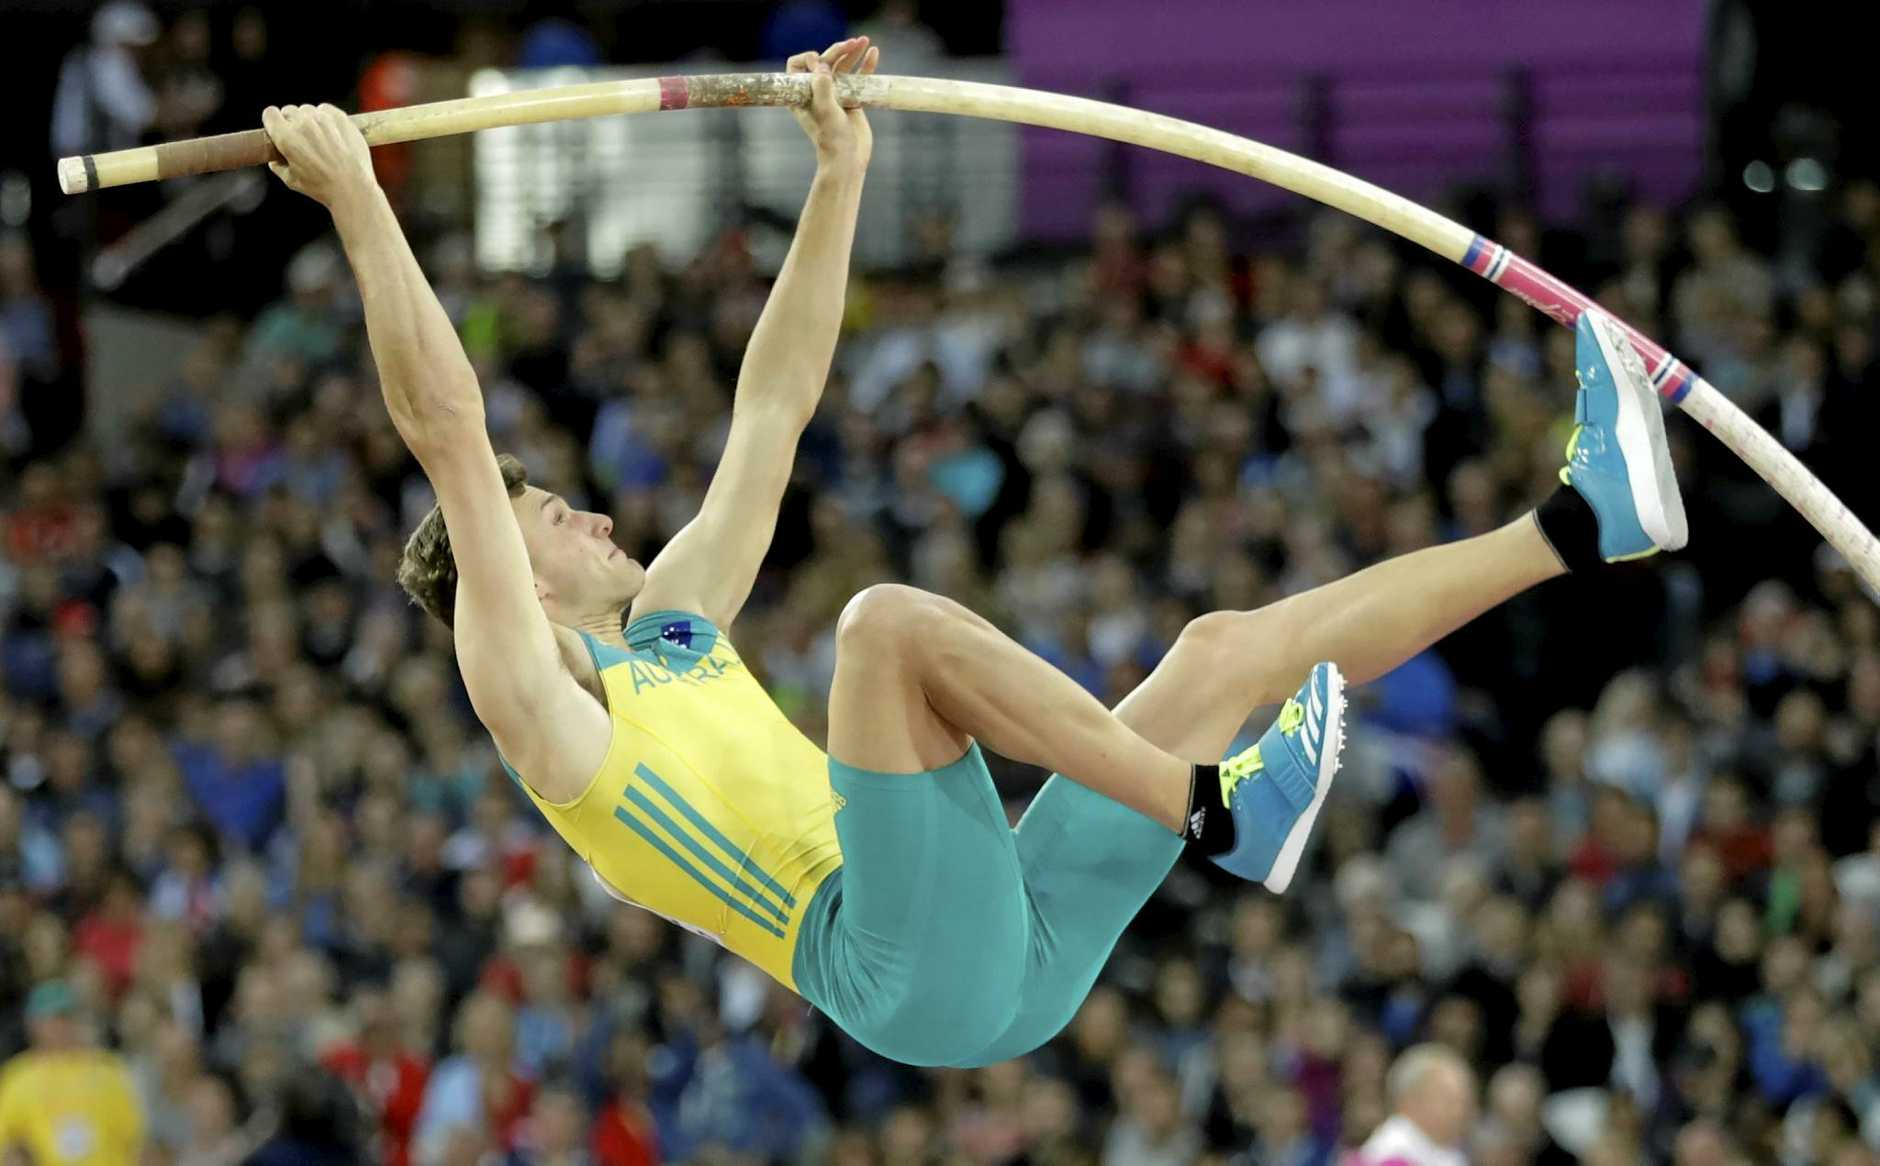 Australia's Kurtis Marschall makes an attempt in the men's pole vault final at  the World Athletics Championships in London